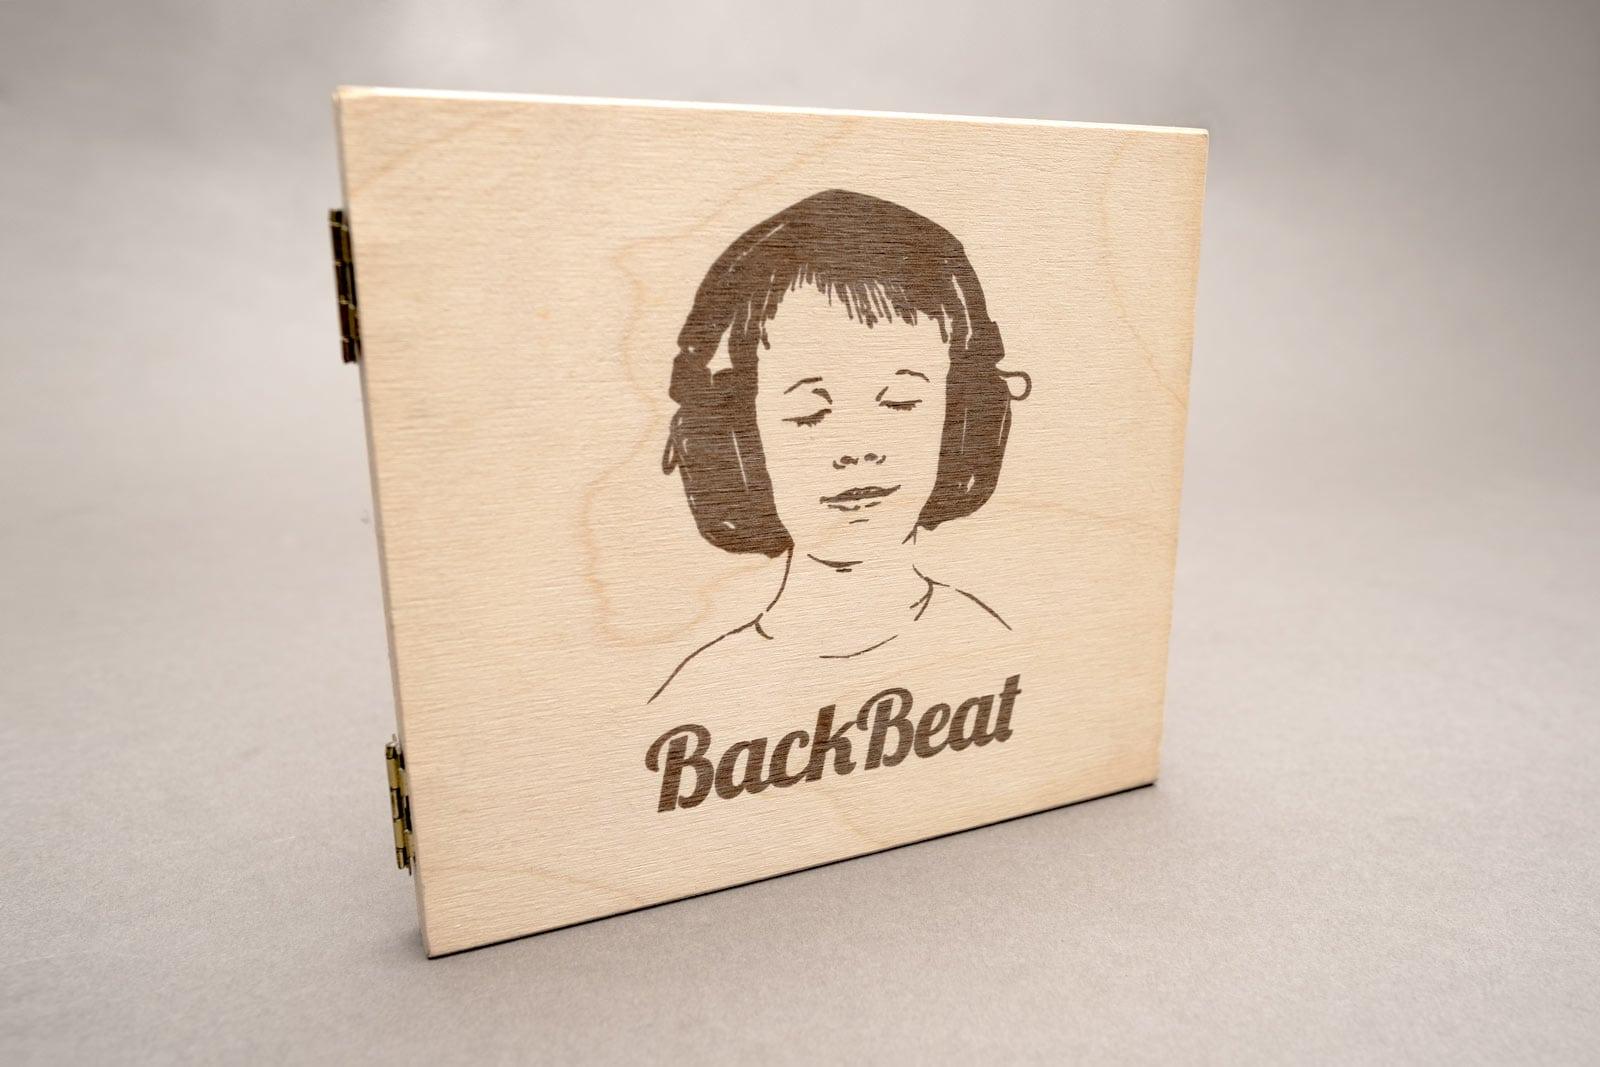 BackBeat, Musik Compilation, CD Cover, CD Holzhülle, Illustration, Cover Artwork, Cover